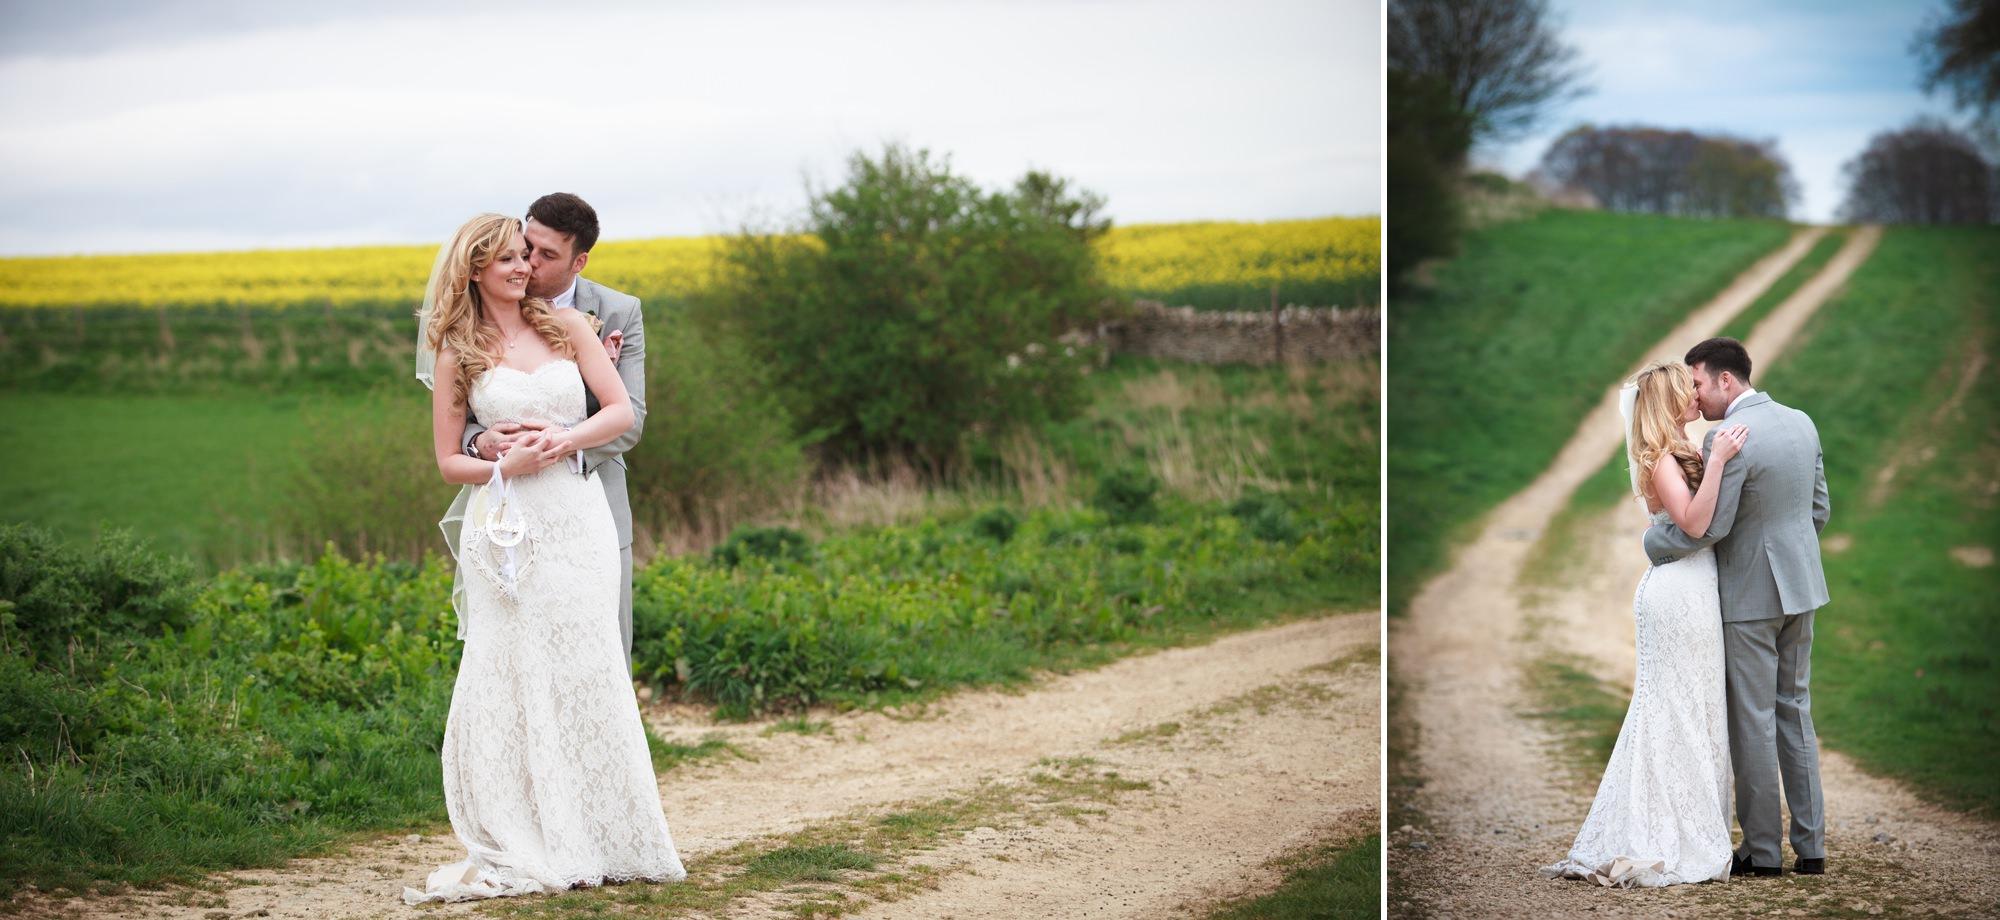 stone-barn-wedding-7